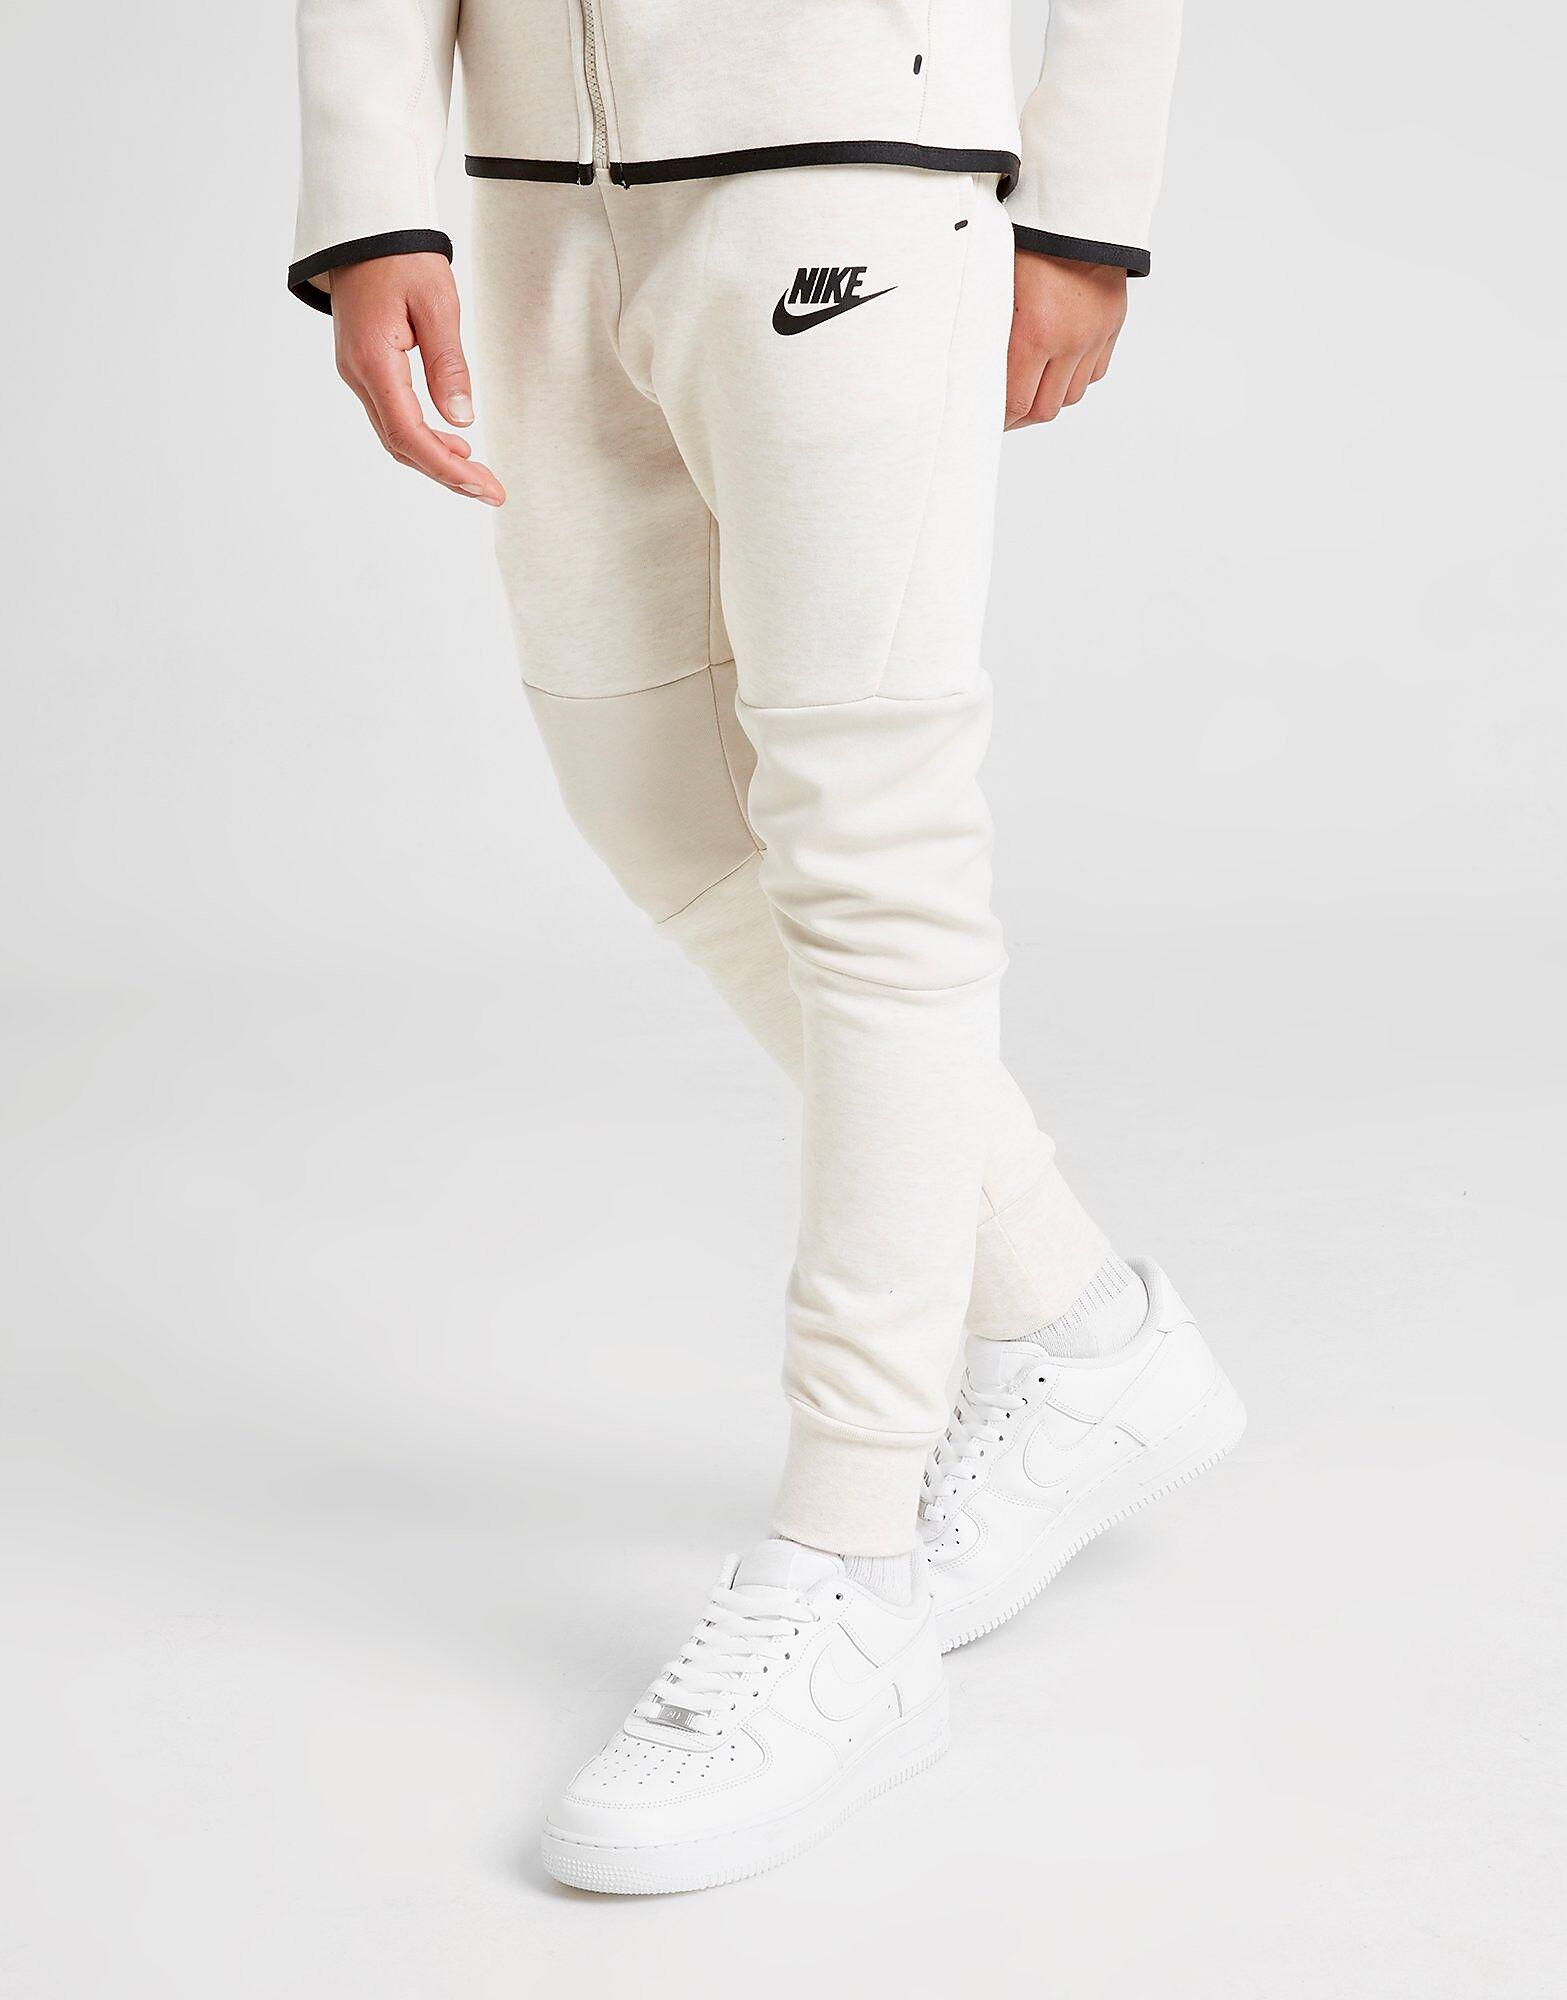 Image of Nike Tech Fleece Verrytelyhousut Juniorit - Kids, Valkoinen